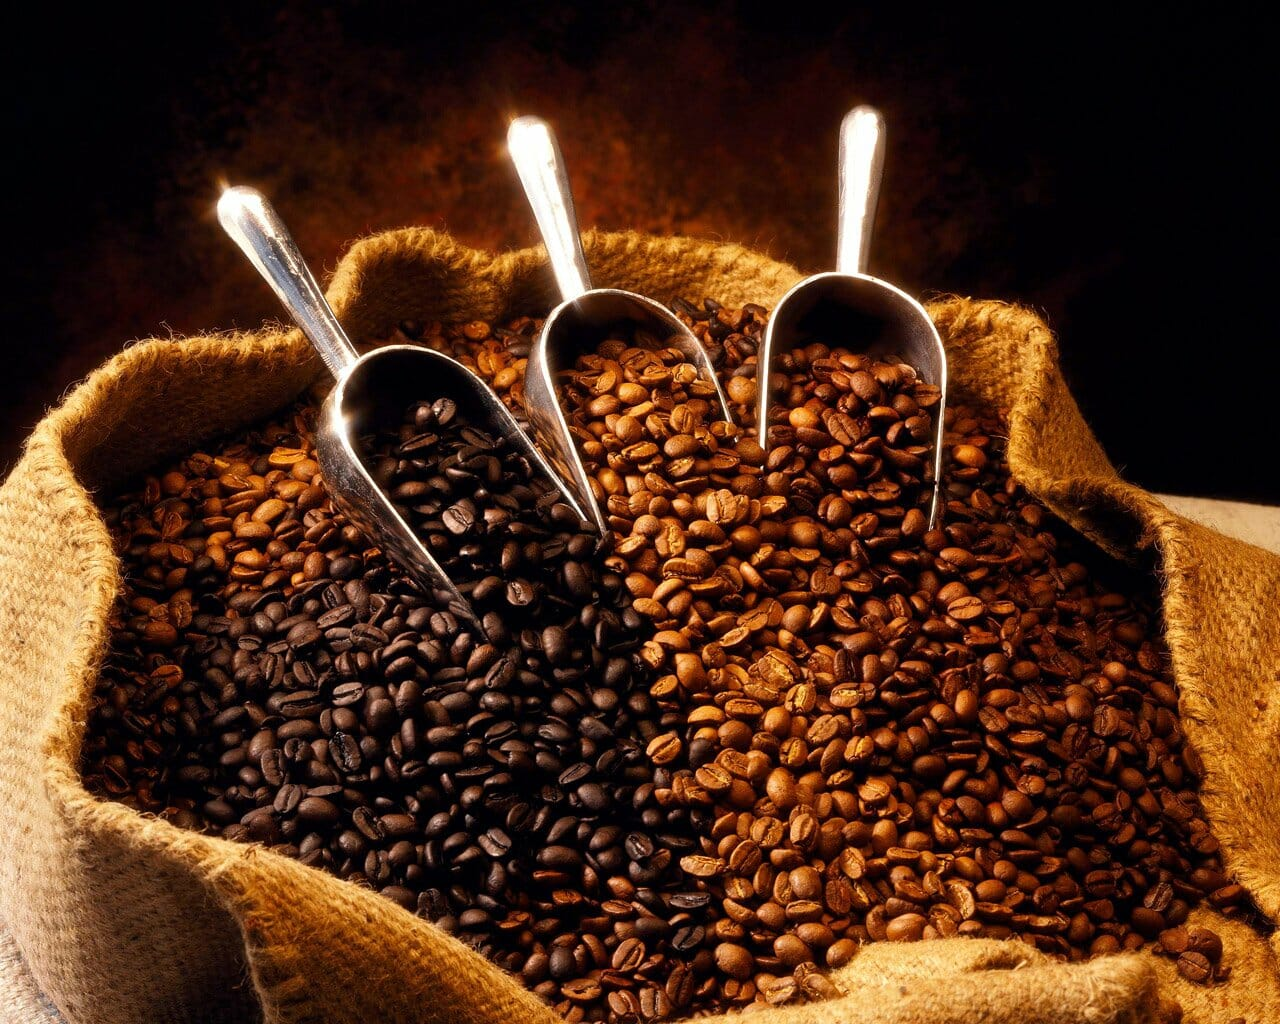 Koffiebonen branden